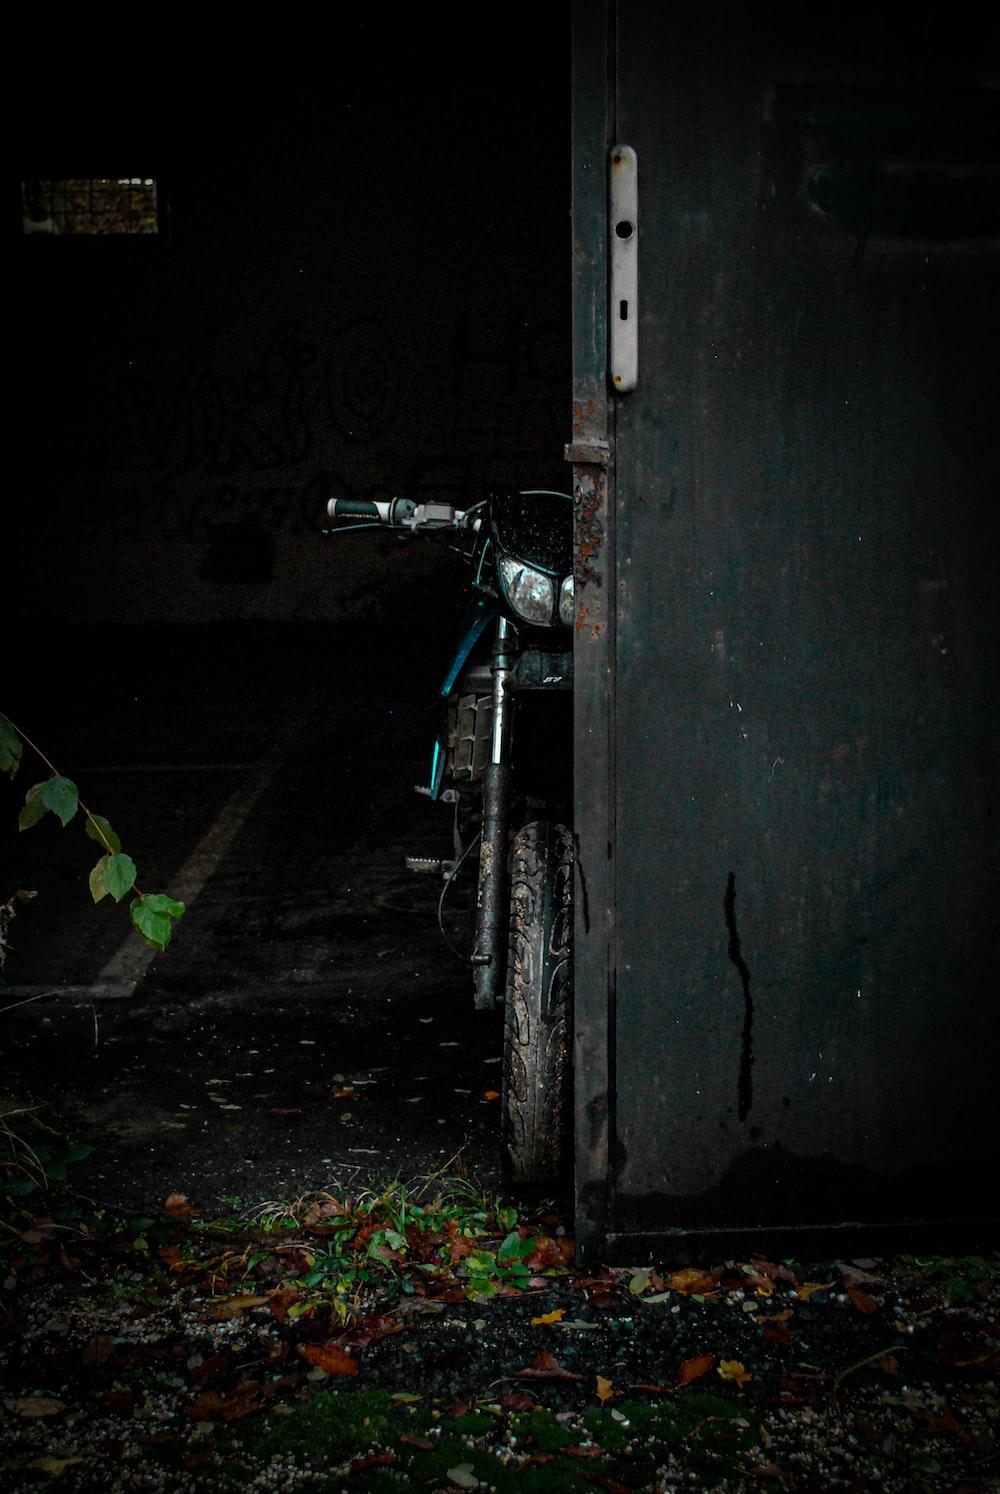 parked bike near door